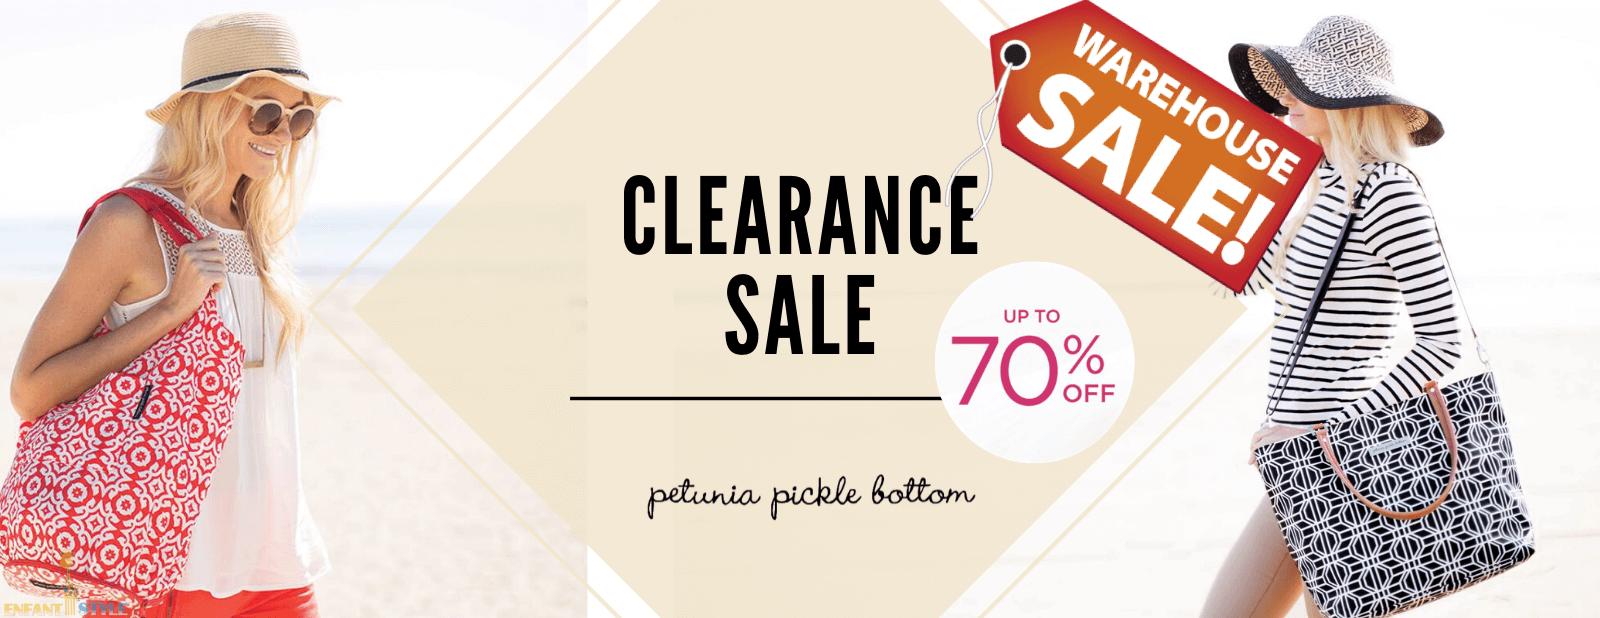 petunia pickle bottom designer diaper bag warehouse sale